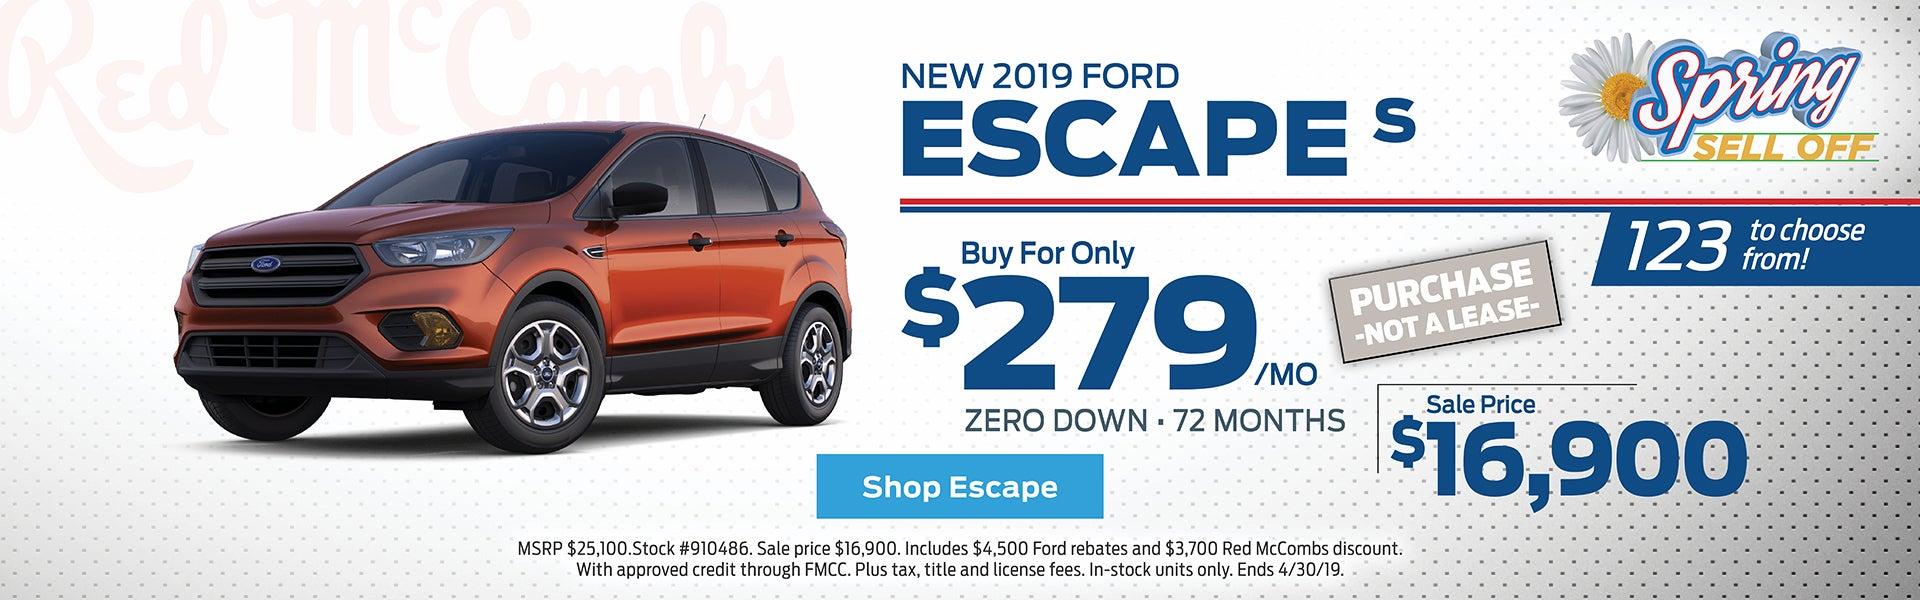 Escape Special Offer